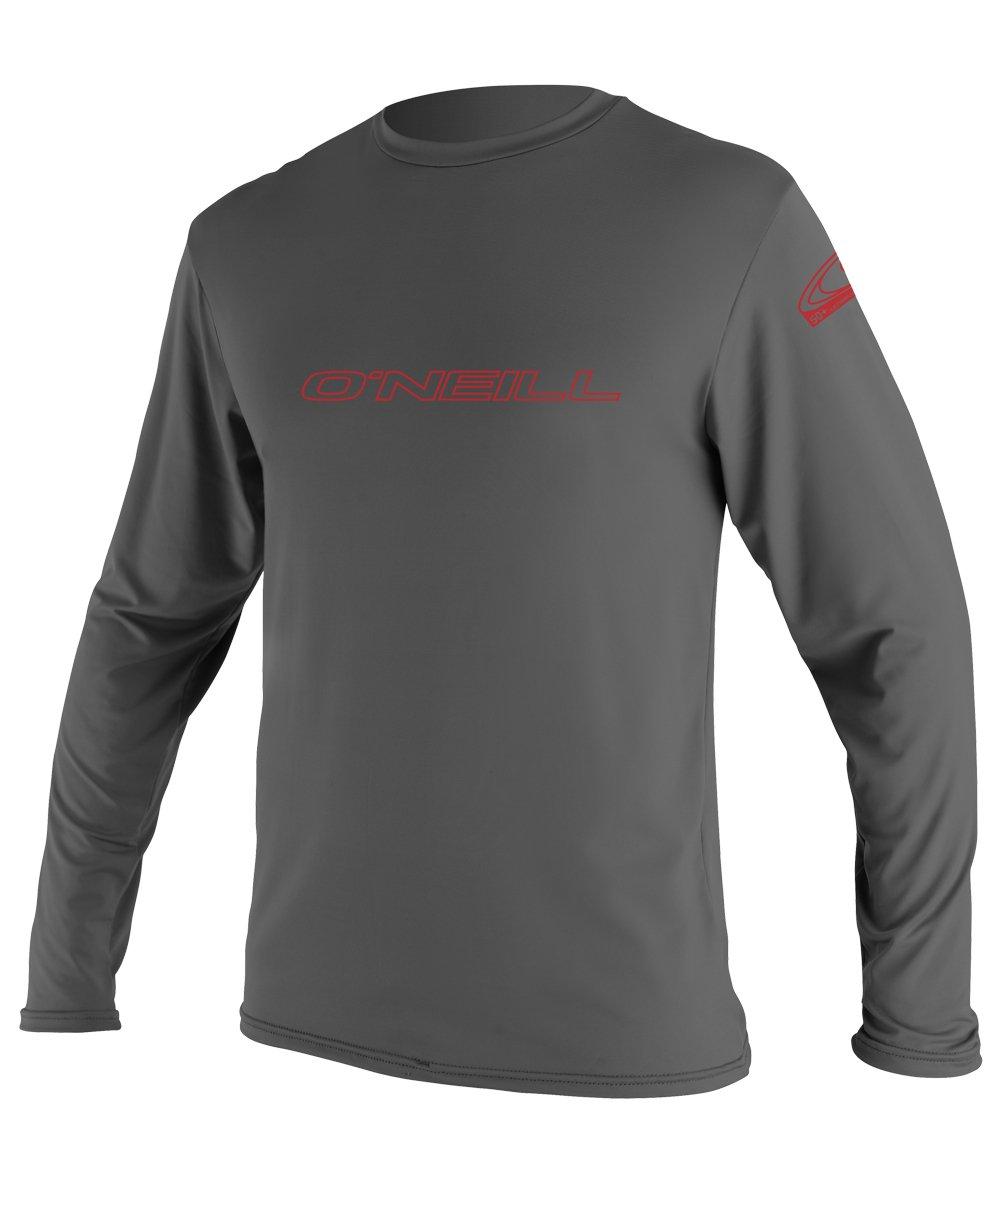 O'Neill Youth Basic Skins UPF 50+ Long Sleeve Sun Shirt, Graphite, 8